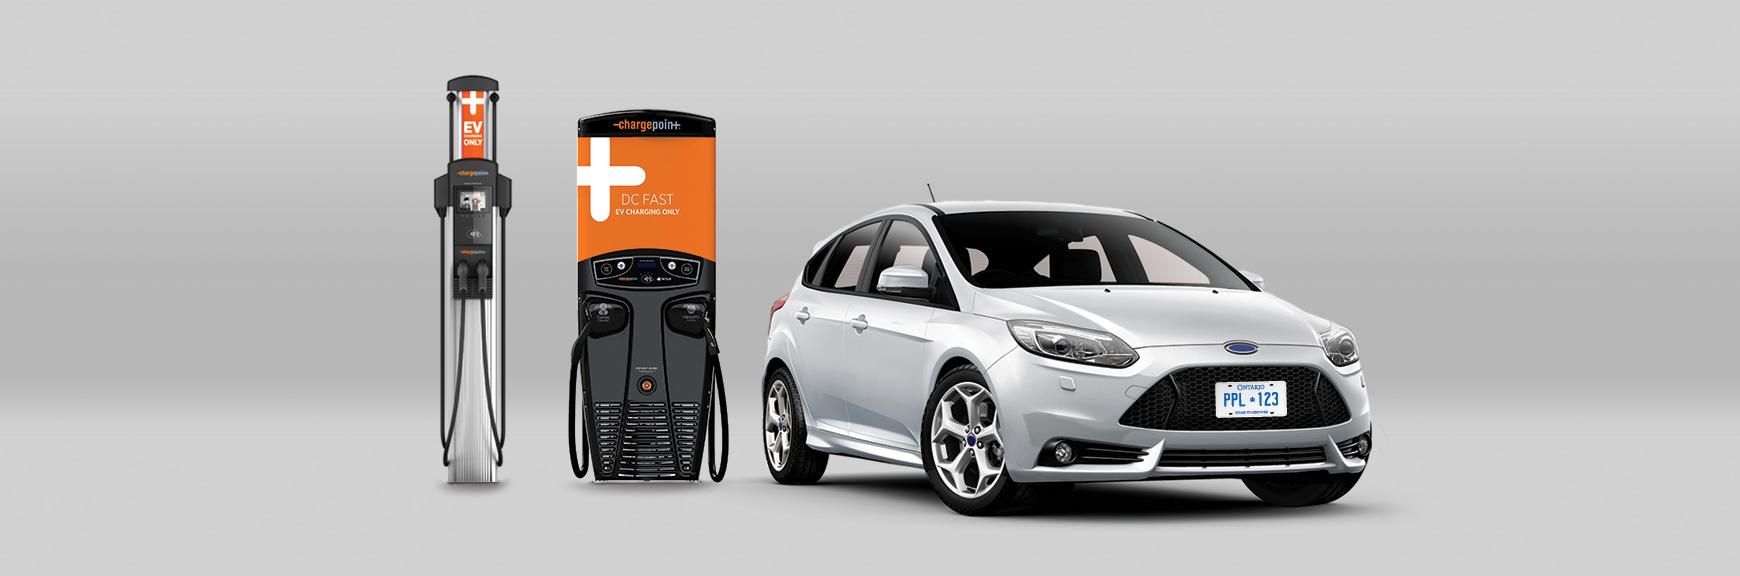 ElectricVehicleCharging_Header brand ppl.jpg